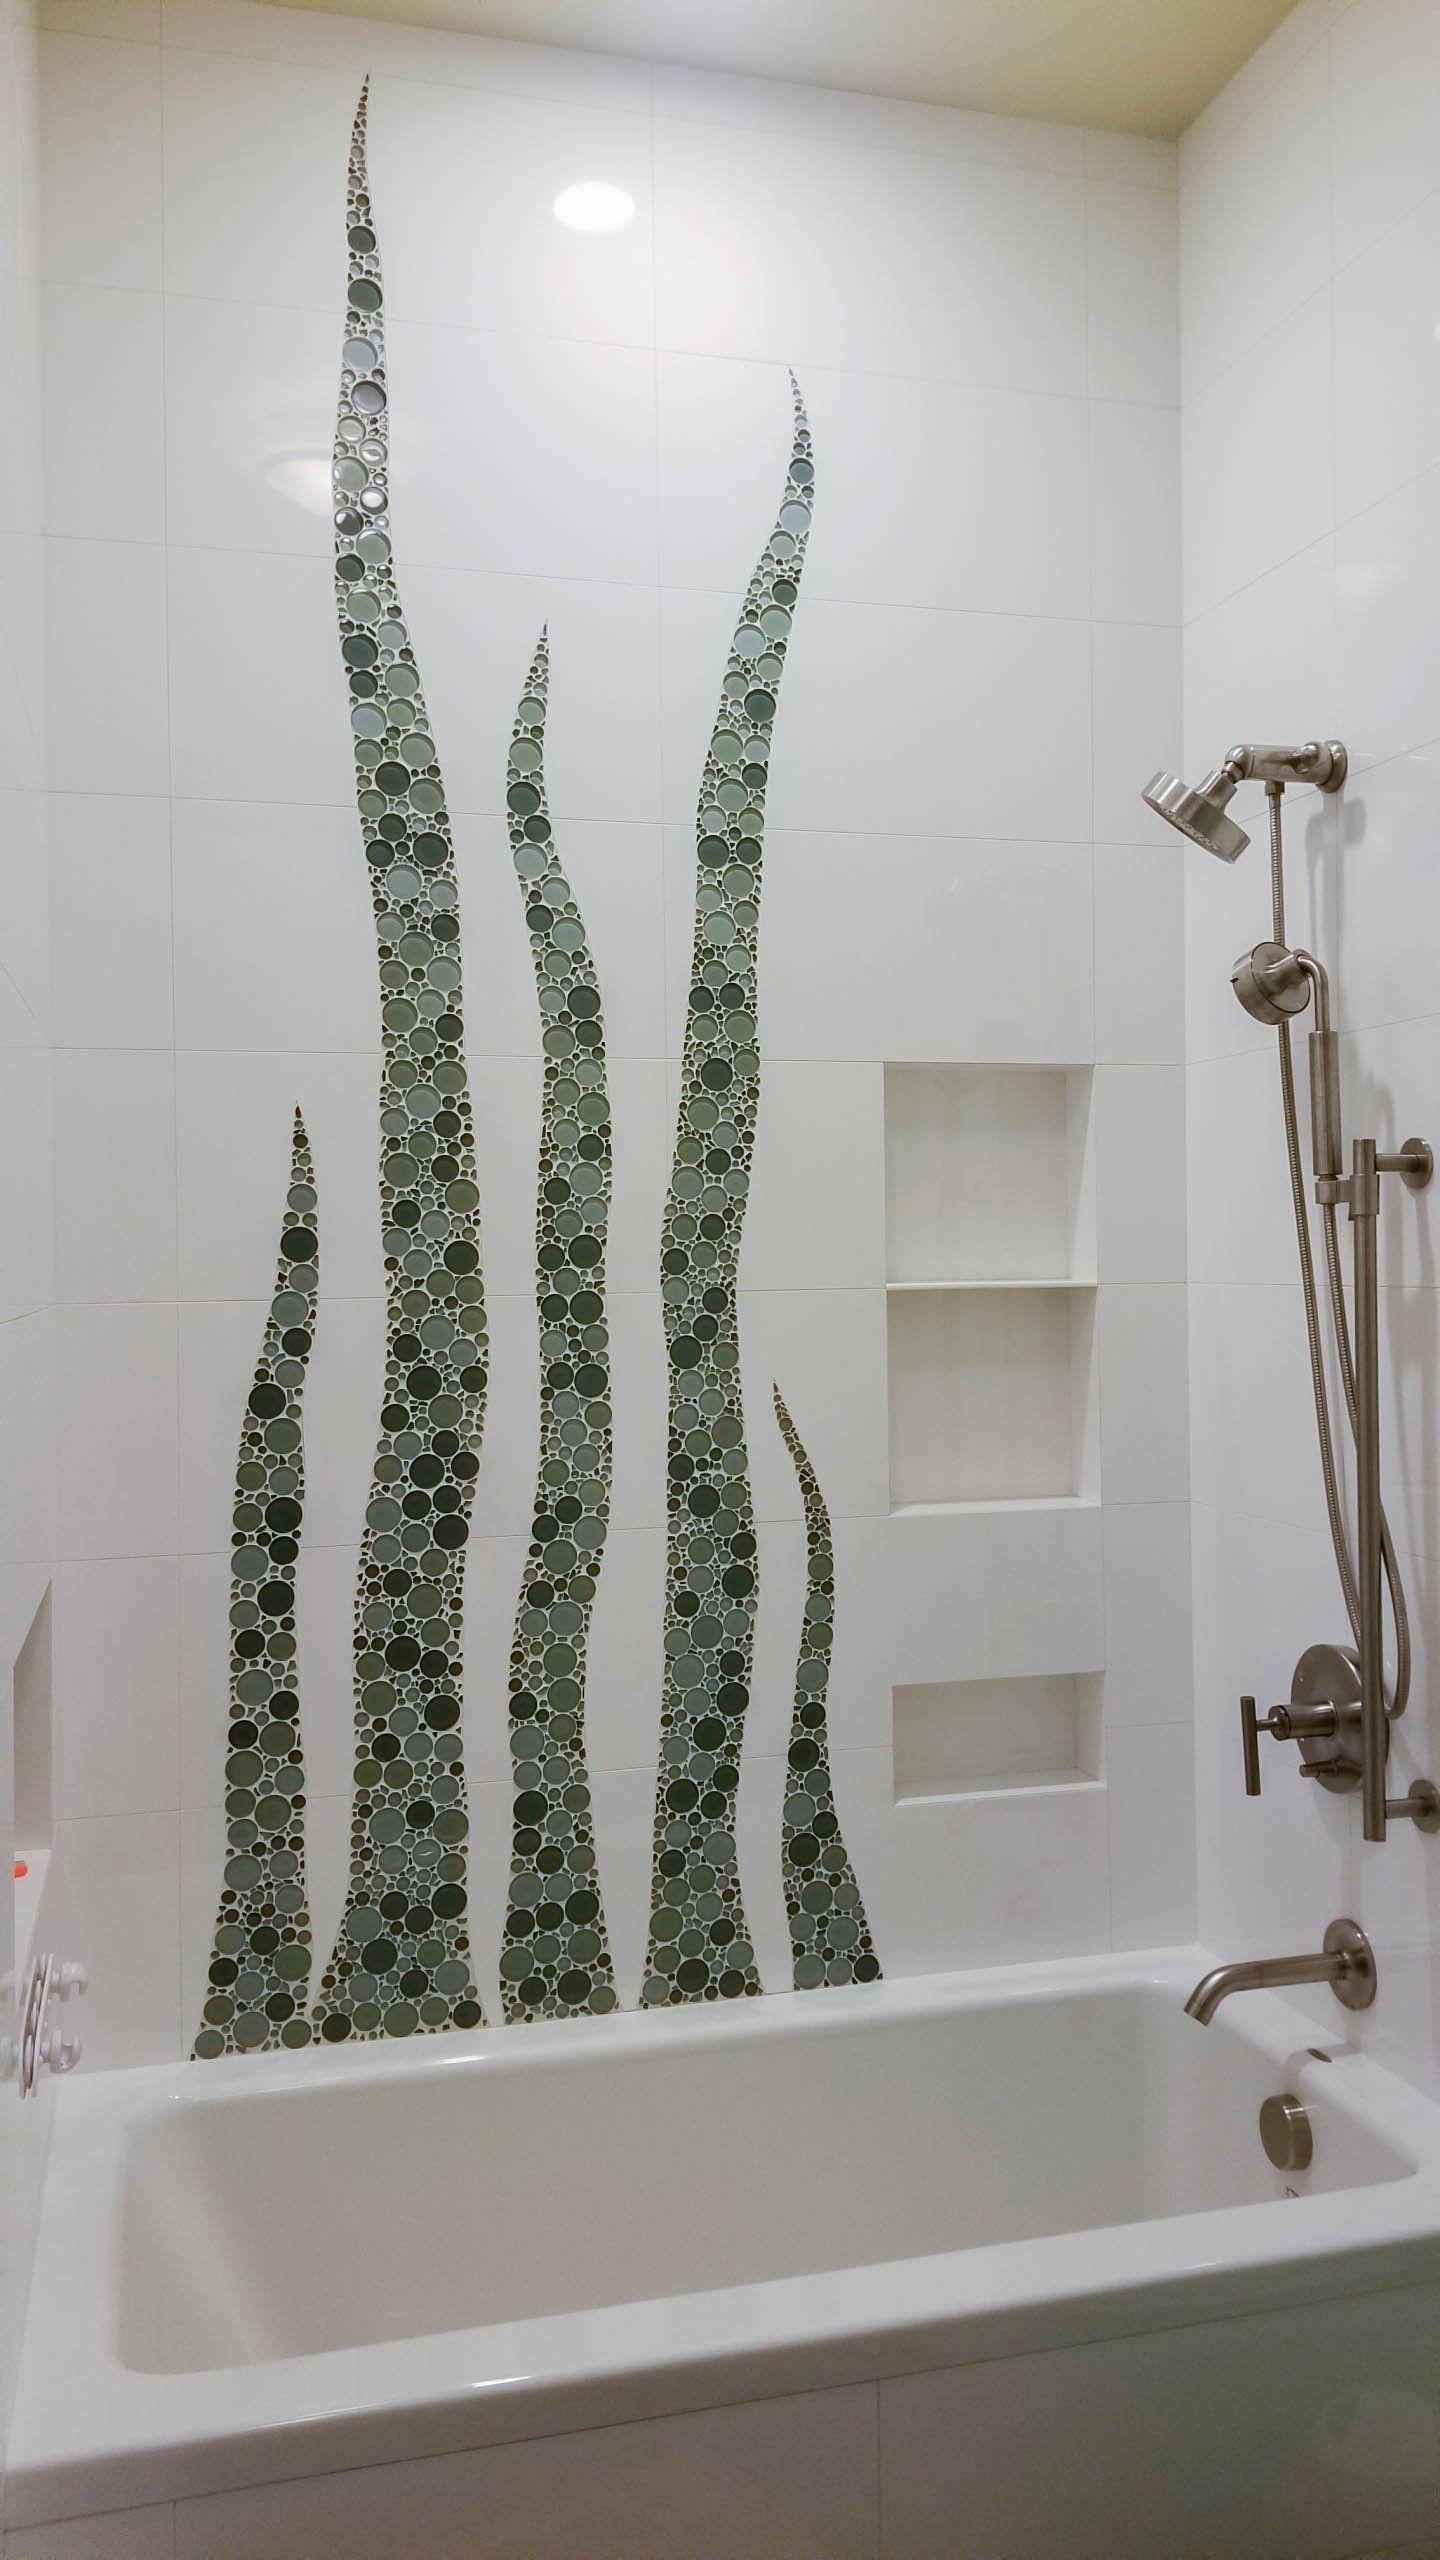 Shower Niche 12x12 Recessed Tile Ready Bathroom Soap Dish Shampoo